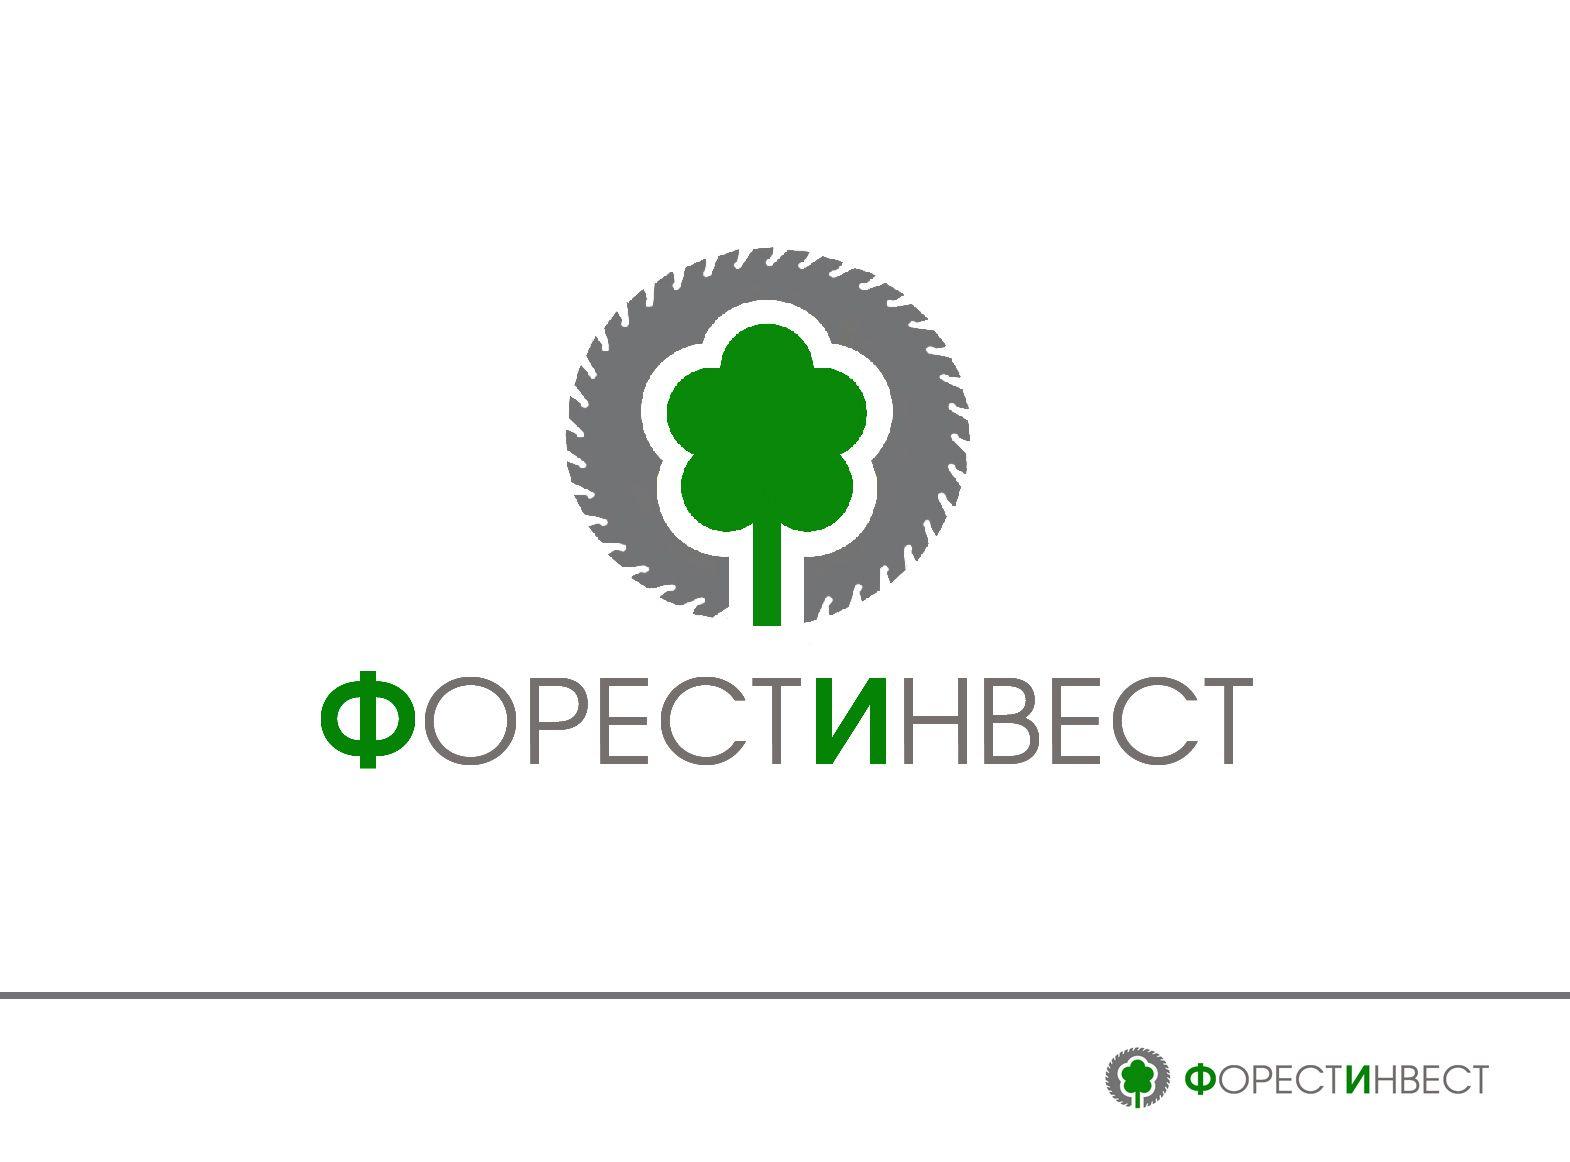 Логотип для лесоперерабатывающей компании - дизайнер BRUINISHE